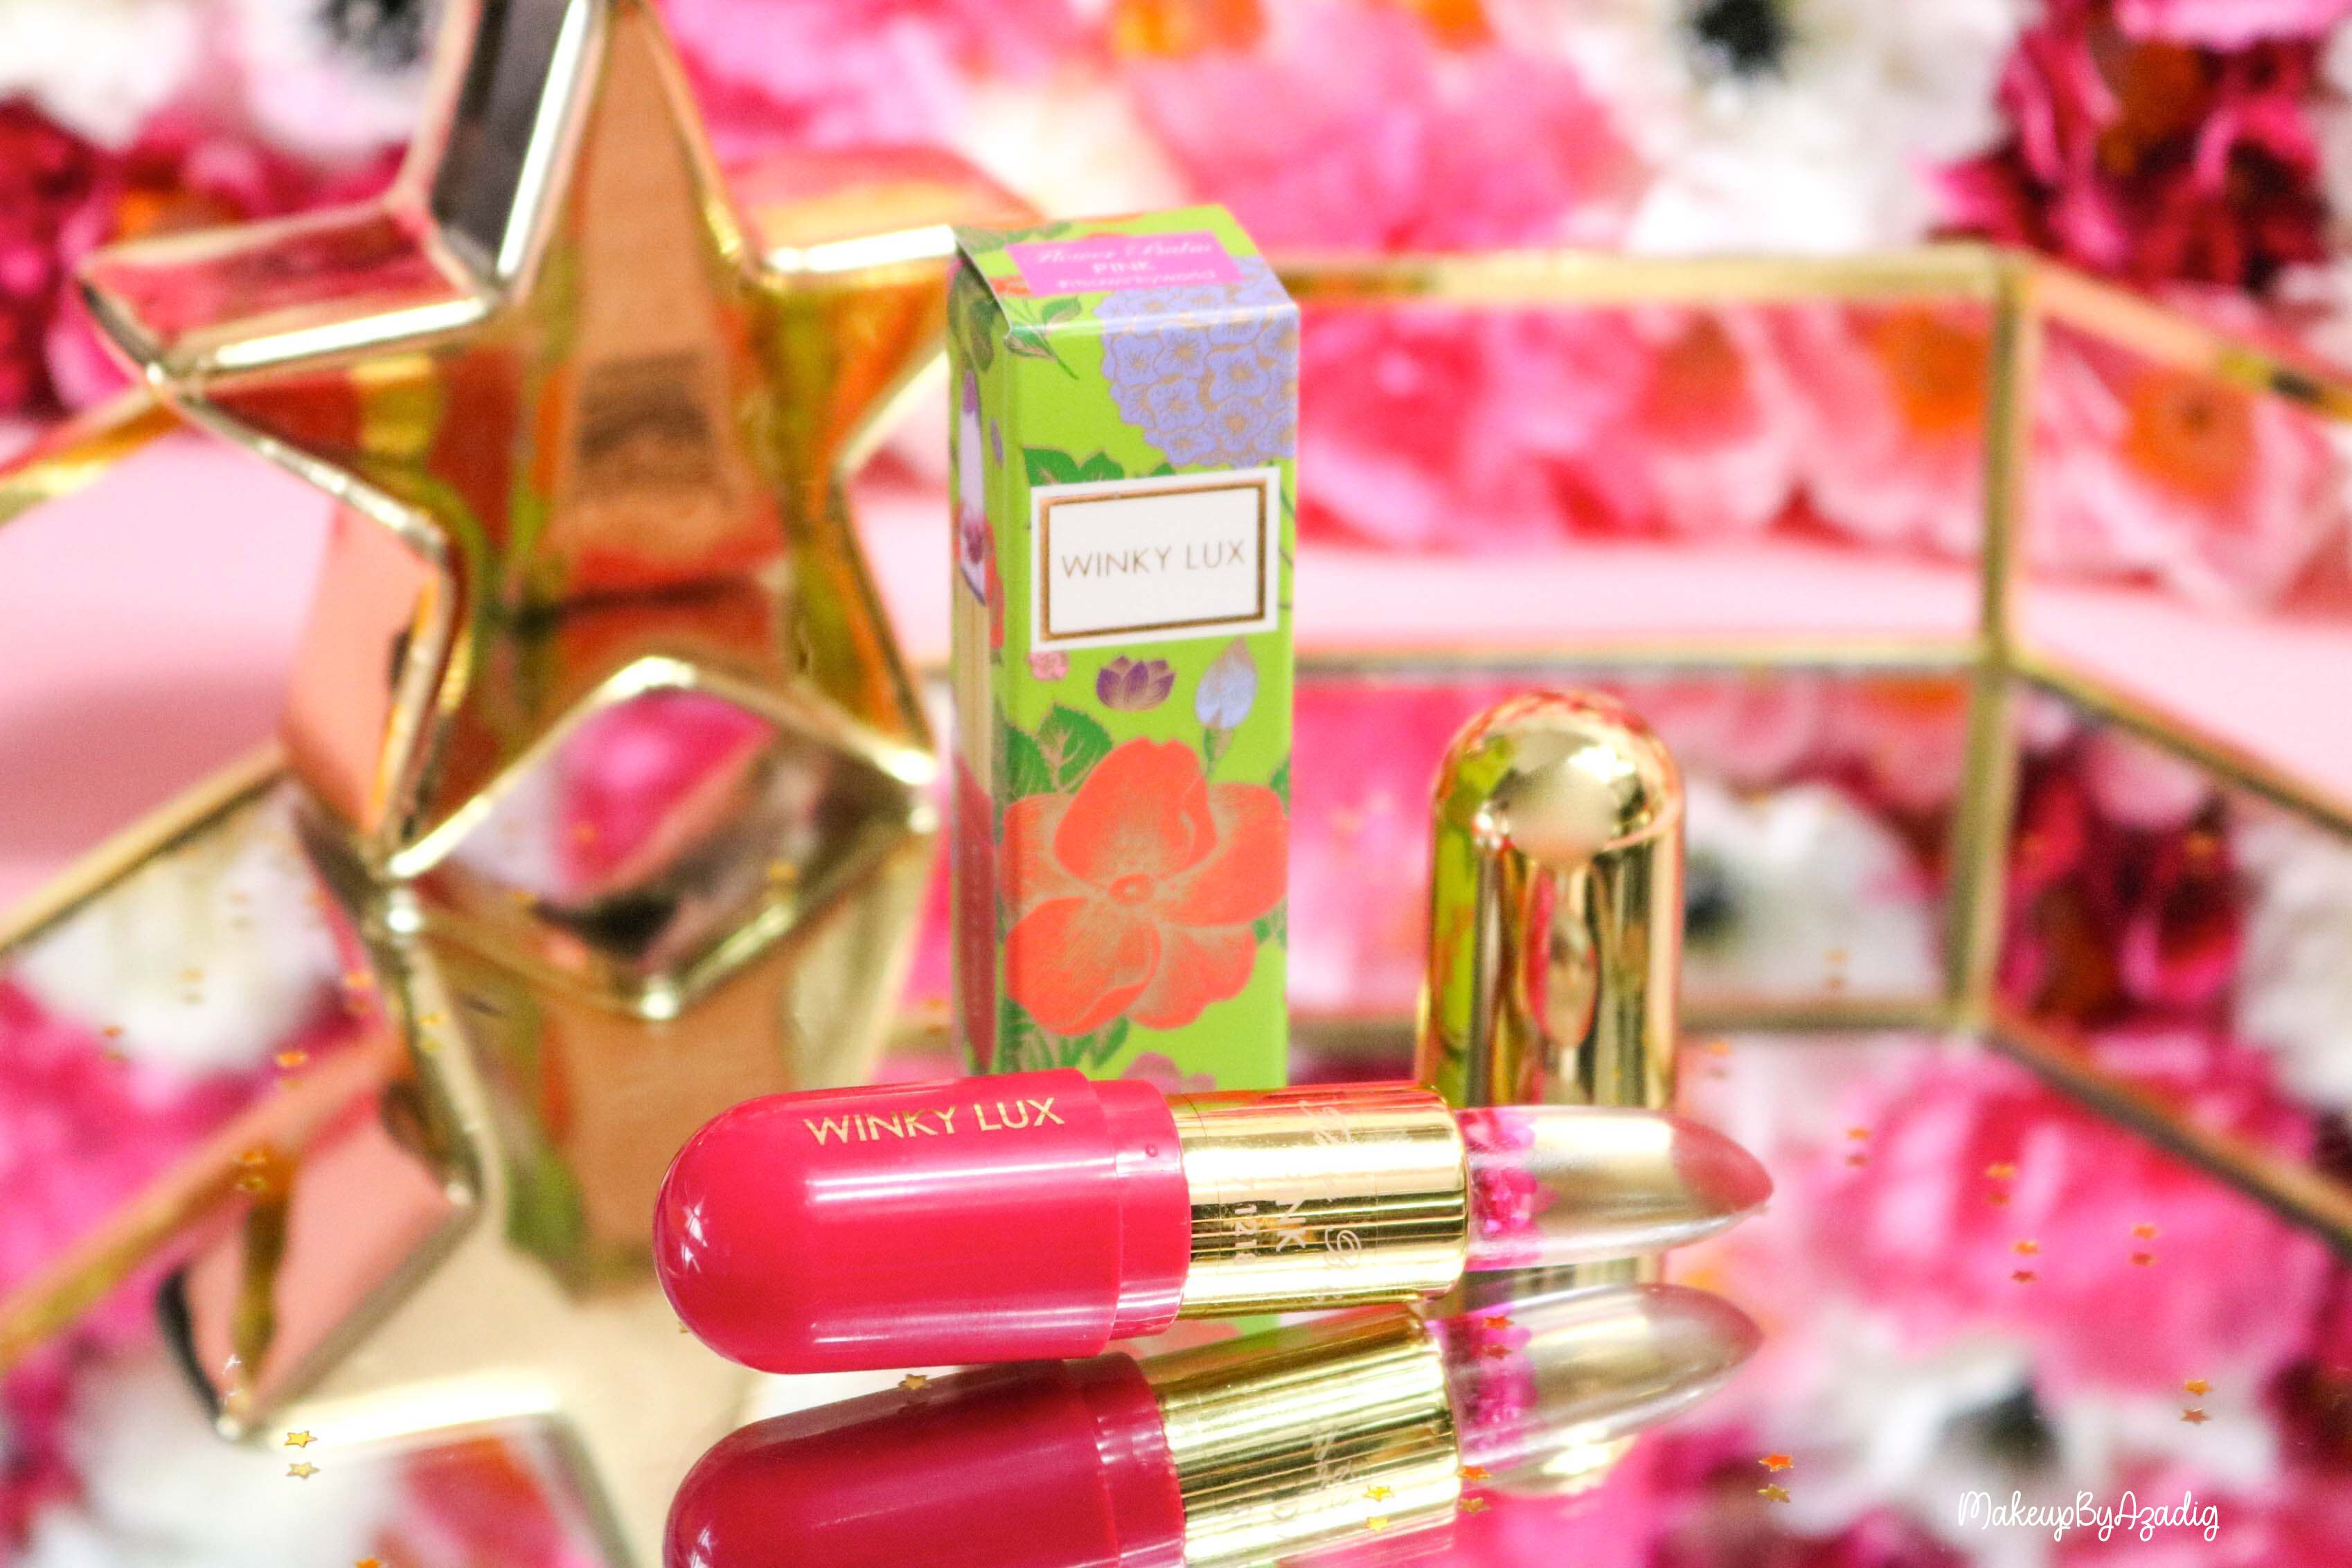 revue-flower-balm-baume-levres-winky-lux-sephora-rose-avis-prix-makeupbyazadig-packaging